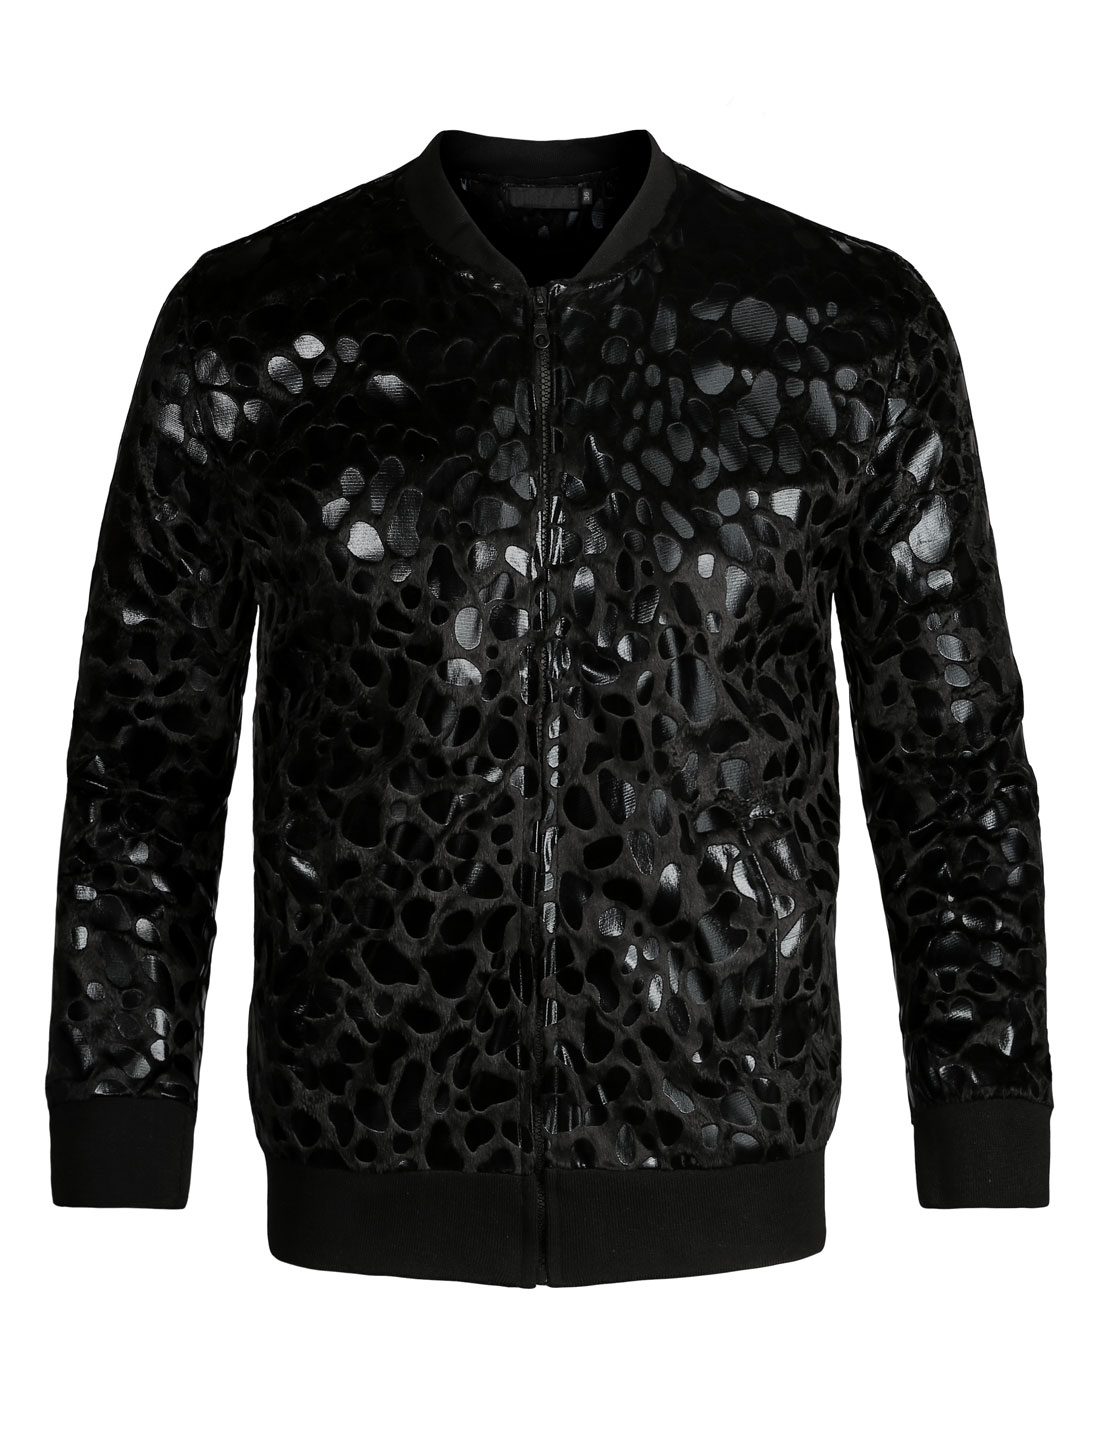 Men Stylish Ribbed Hem and Cuffs Leopard Print Casual Jacket Black M